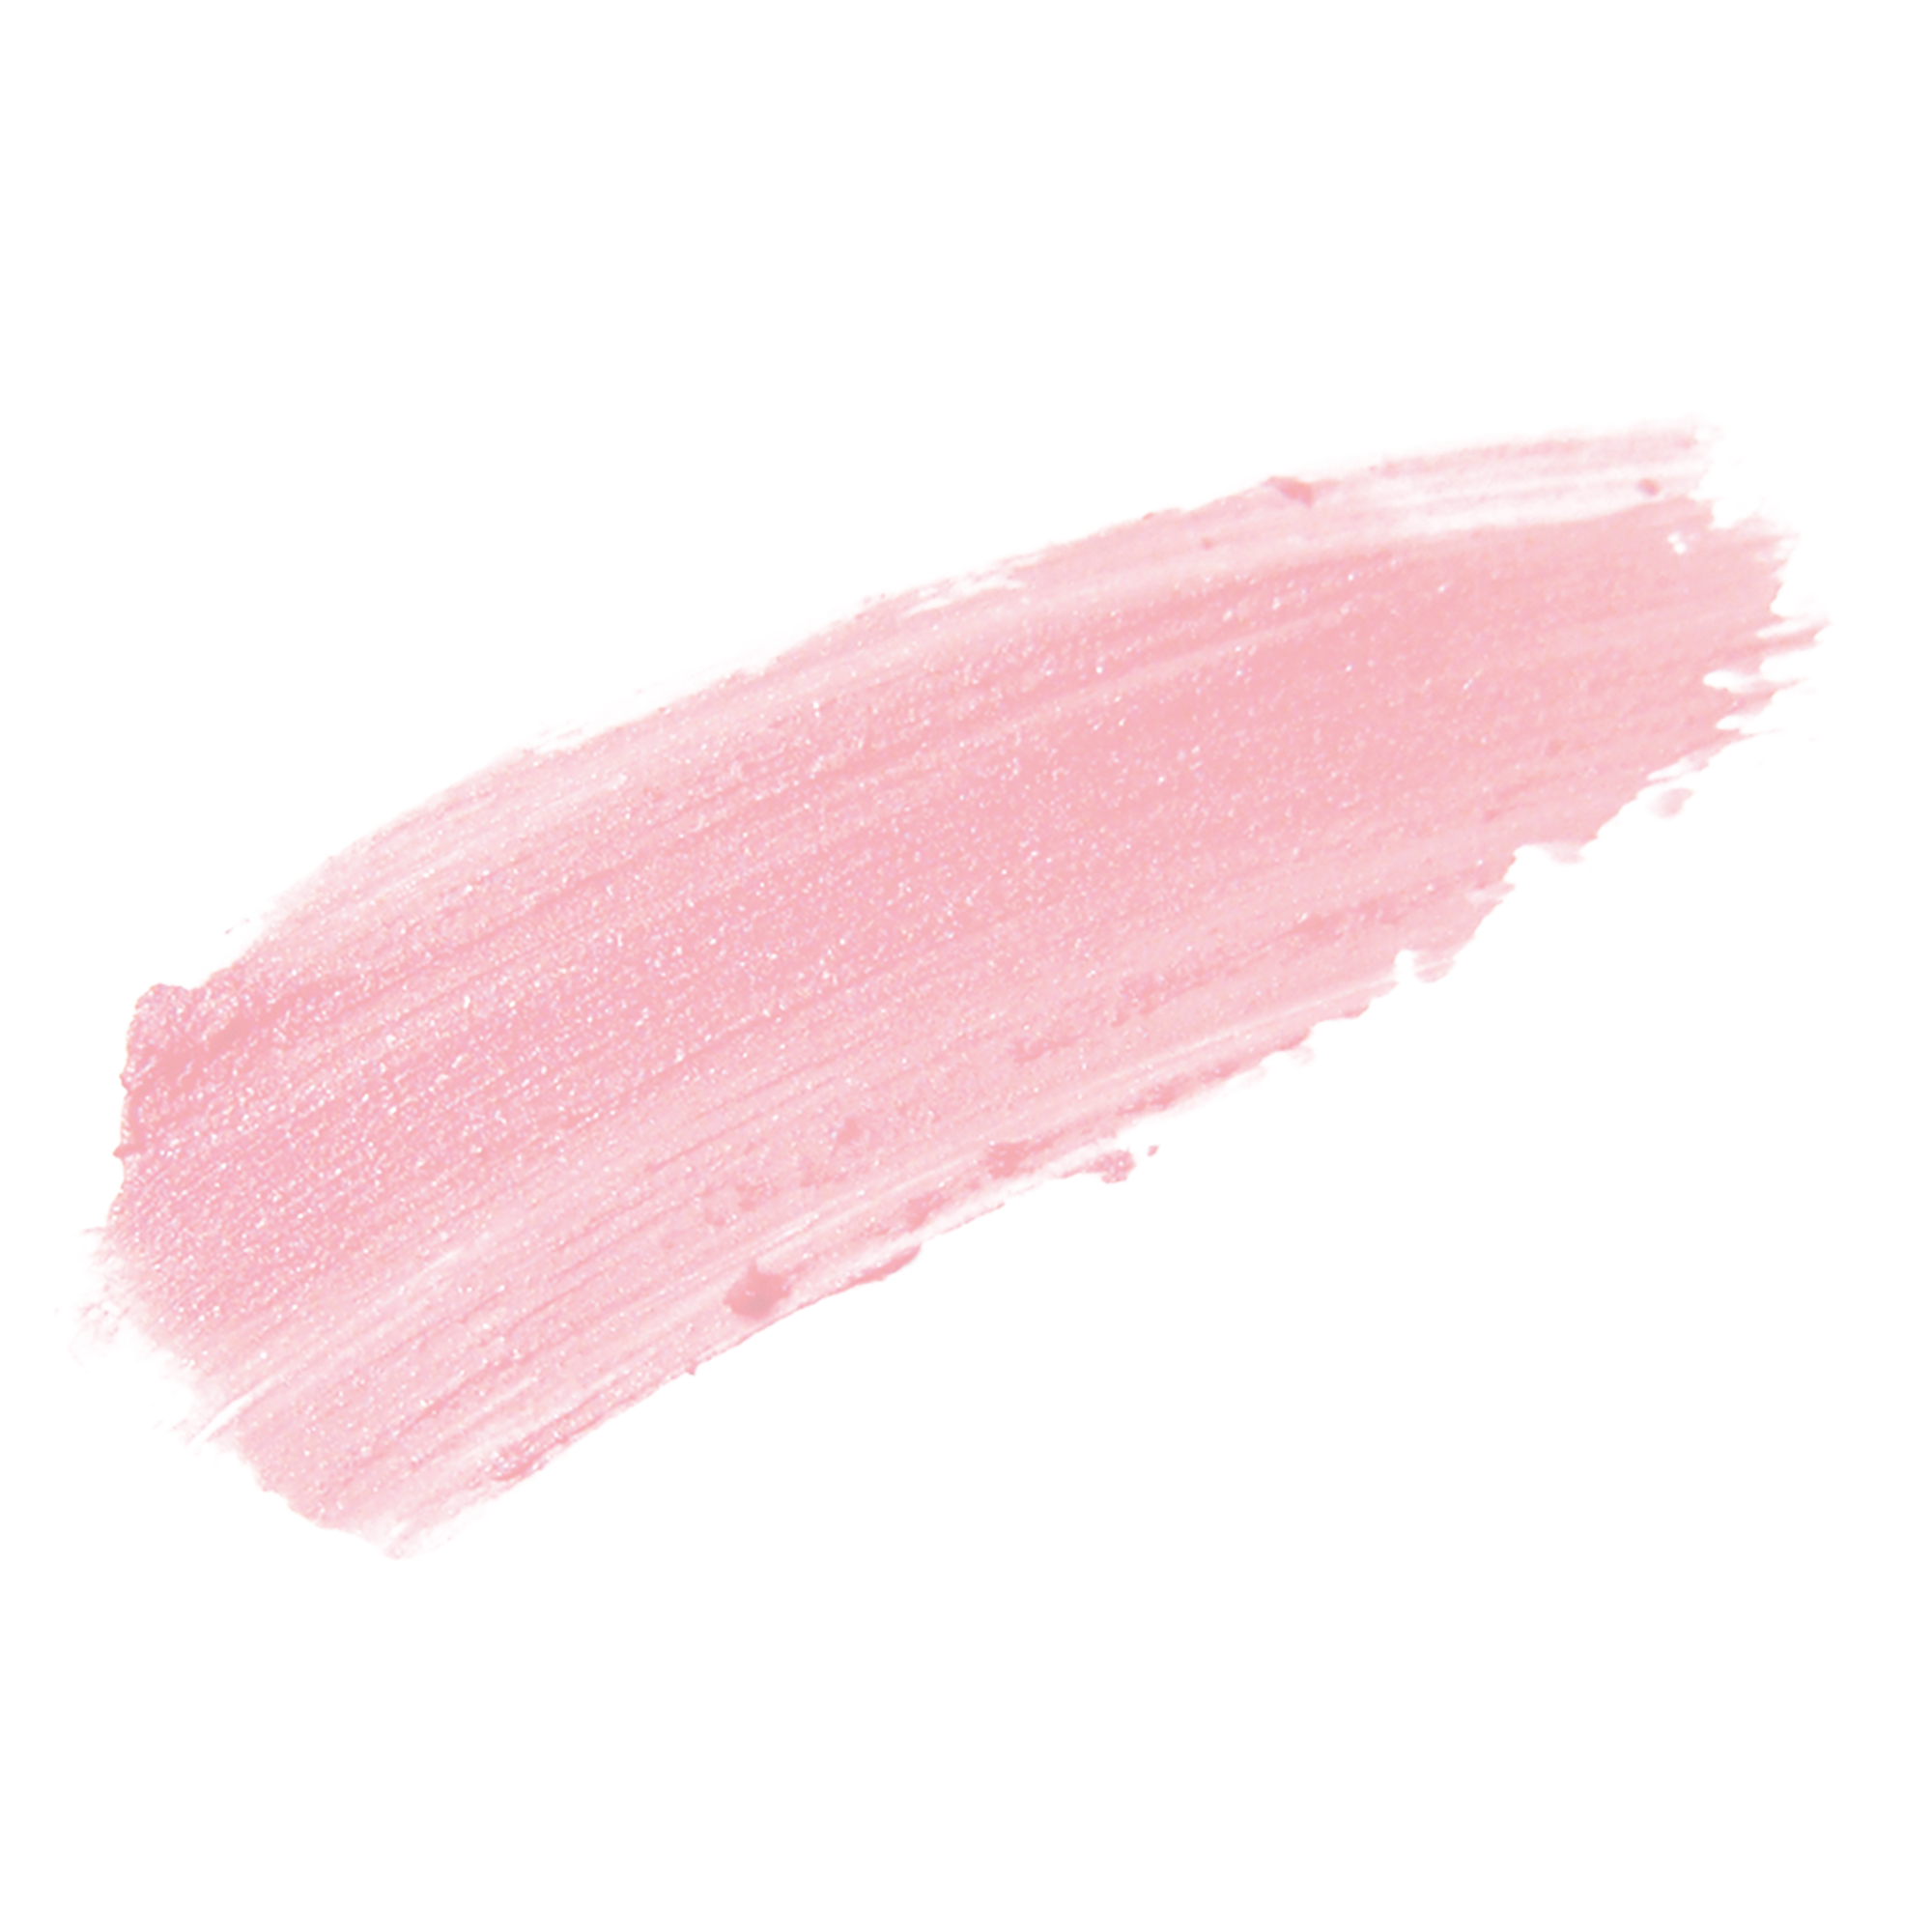 Vitality Lip Flush 4-in-1 Reviver Lipstick Stain Je Ne Sais Quoi